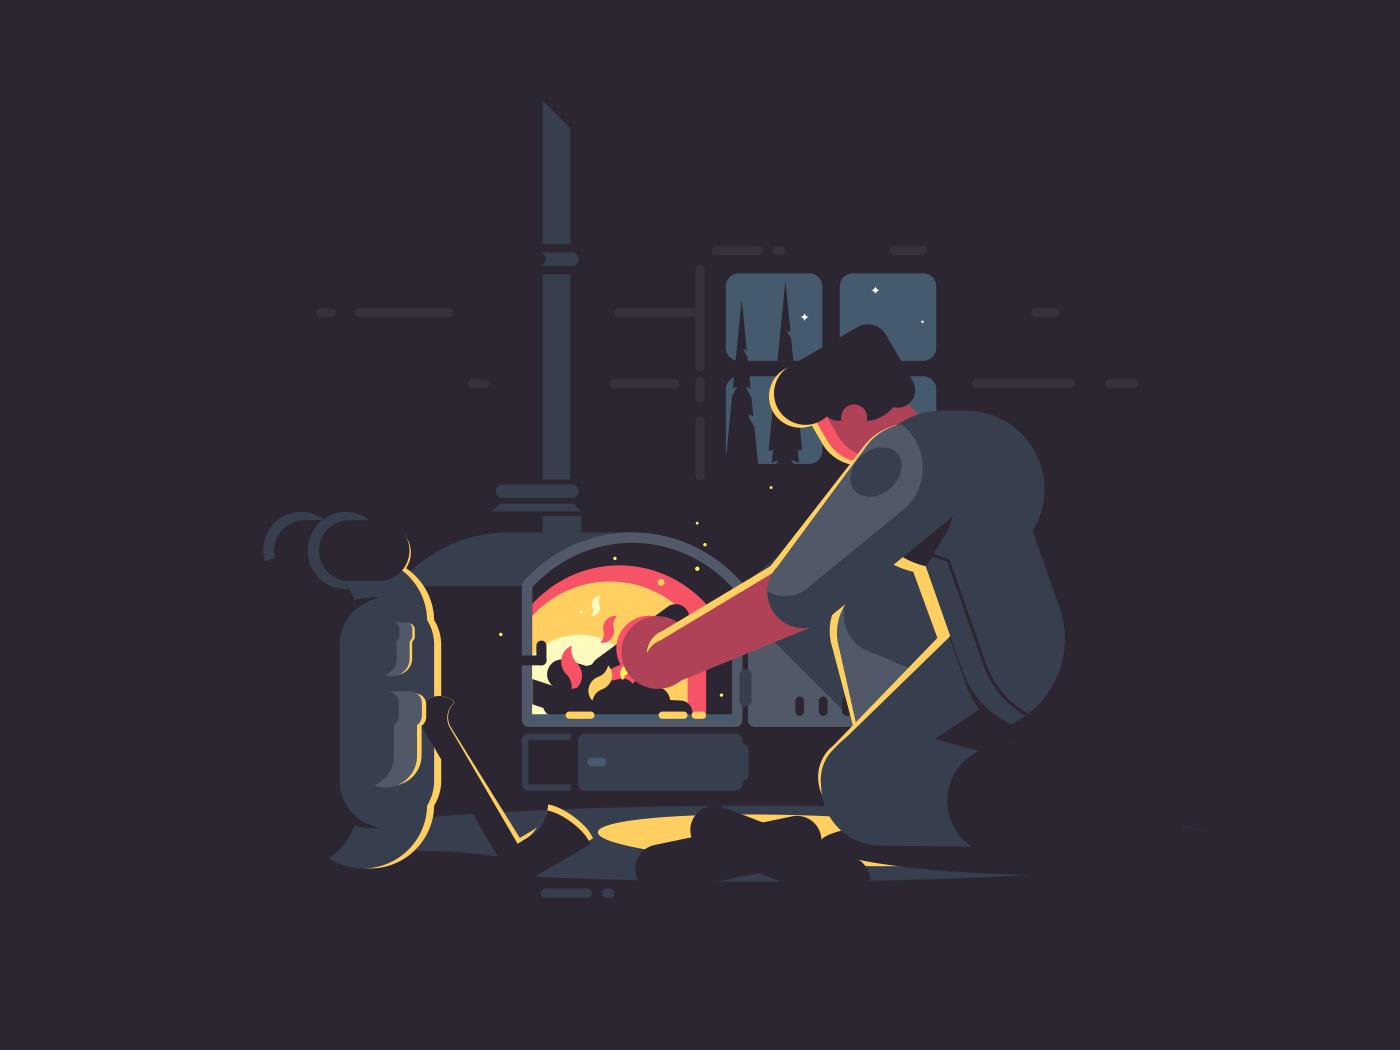 Traveler man warm by furnace in hut at night. Vector illustration